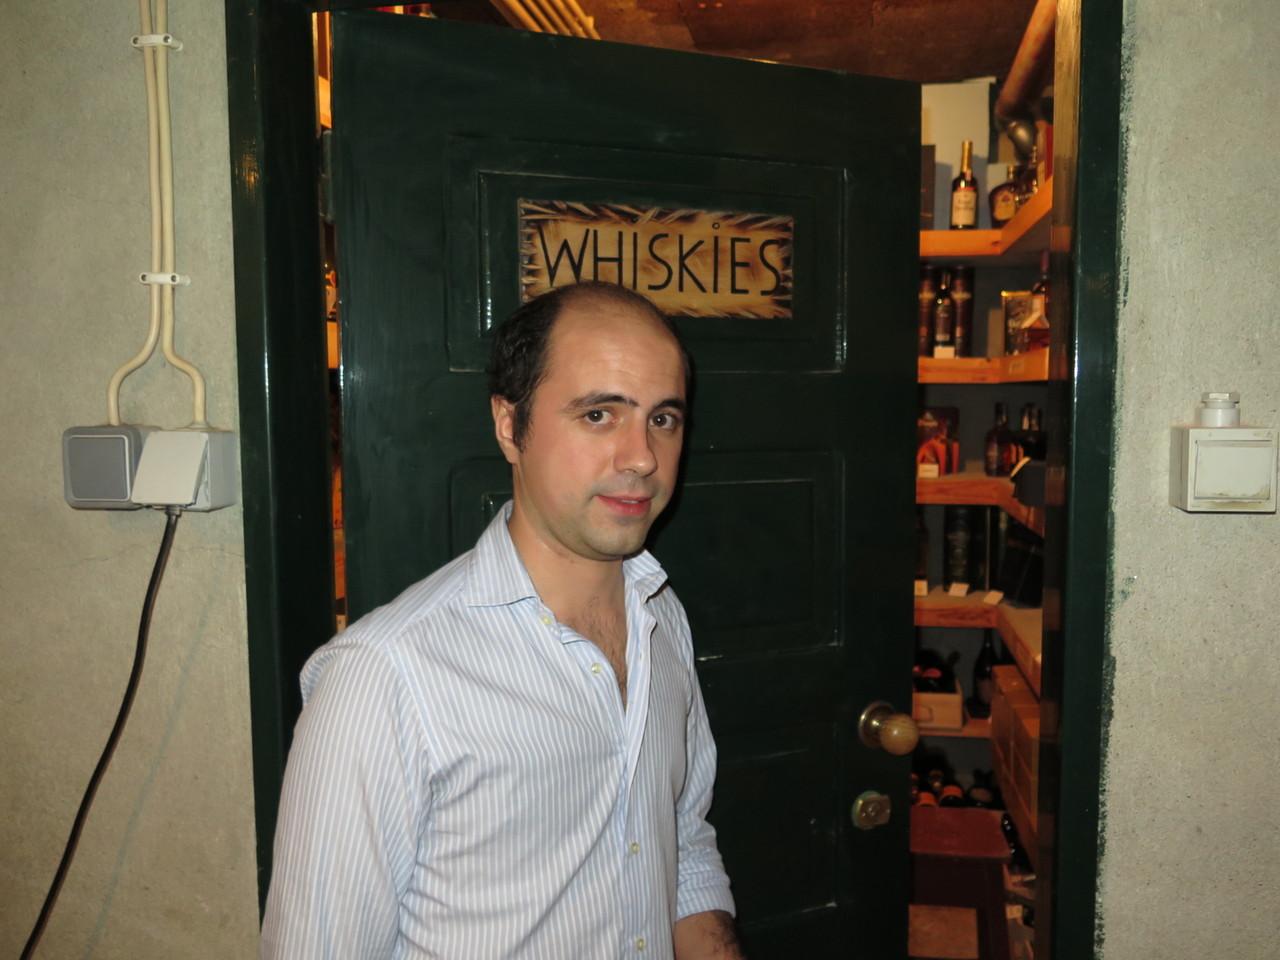 A sala dos whiskies